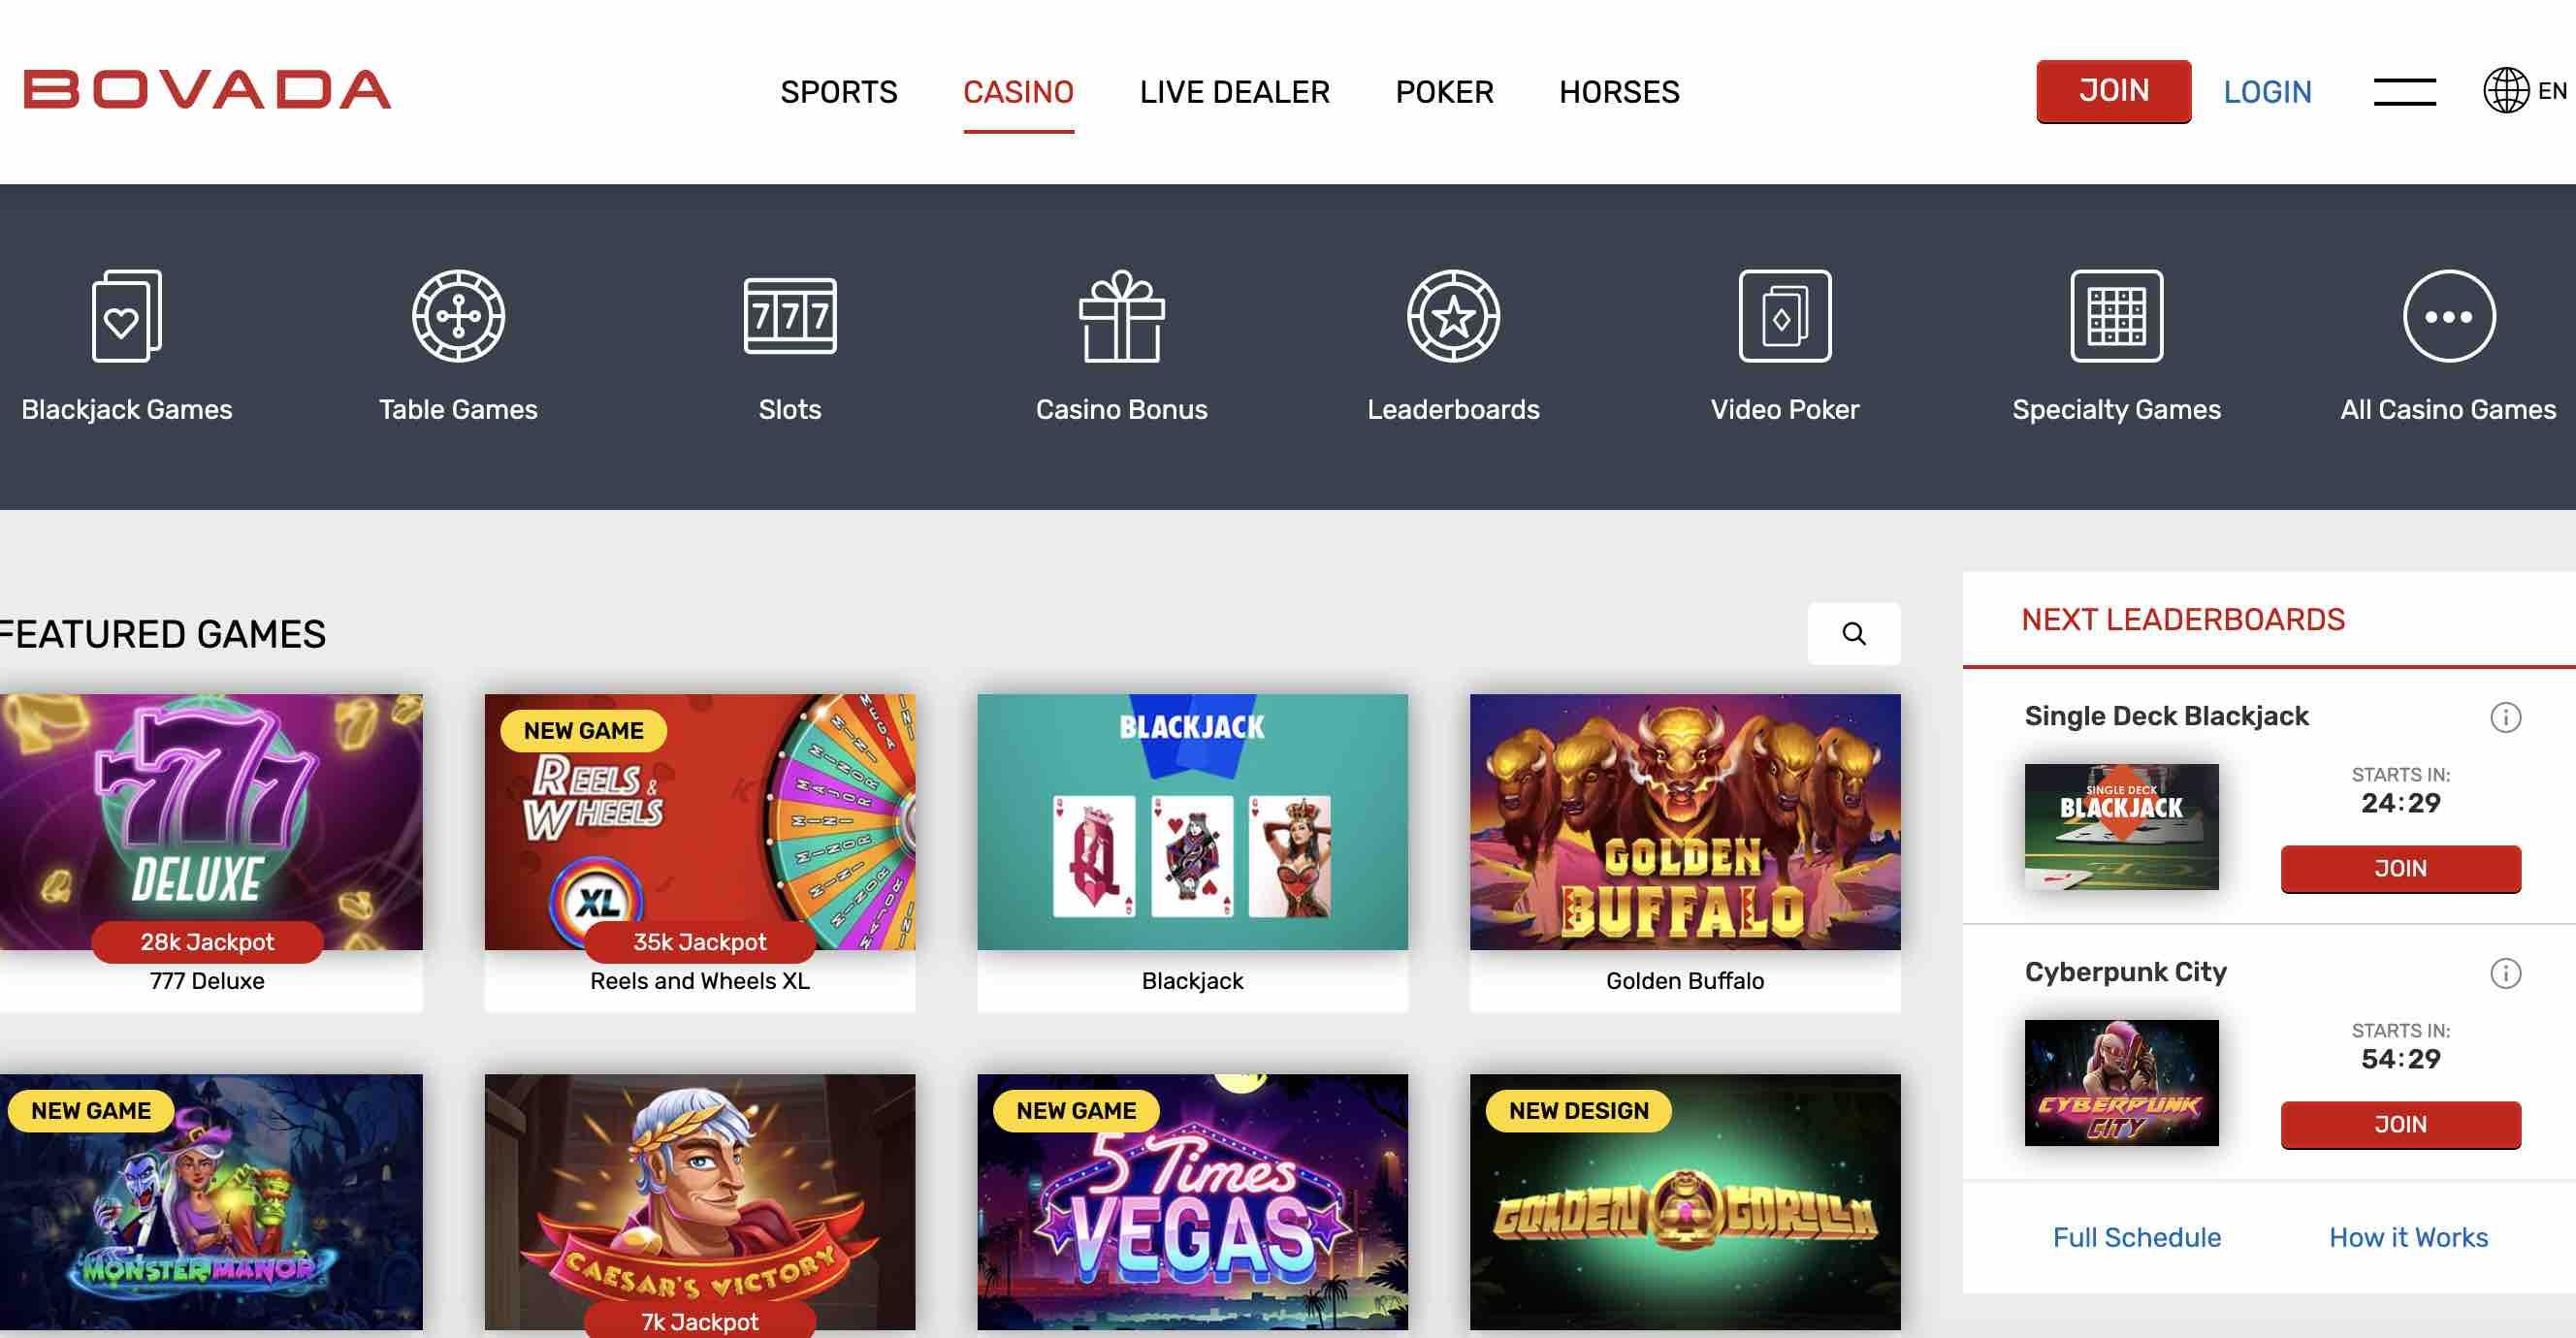 Bovada Casino Review Info